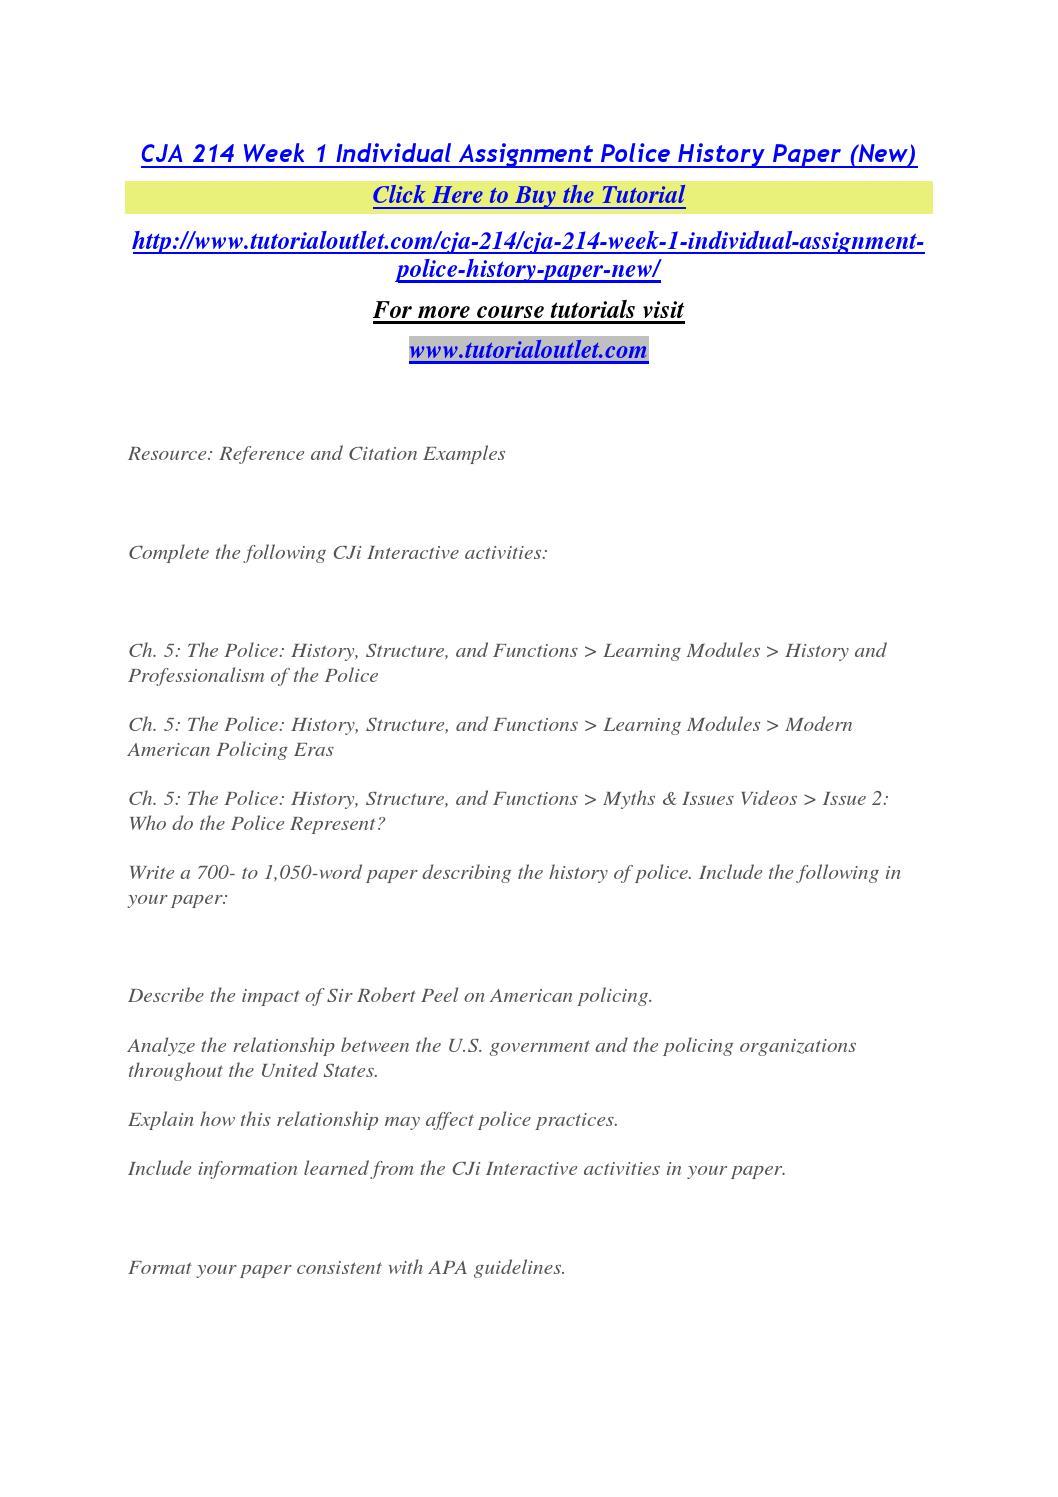 CJA 214 Courses / cja214dotcom